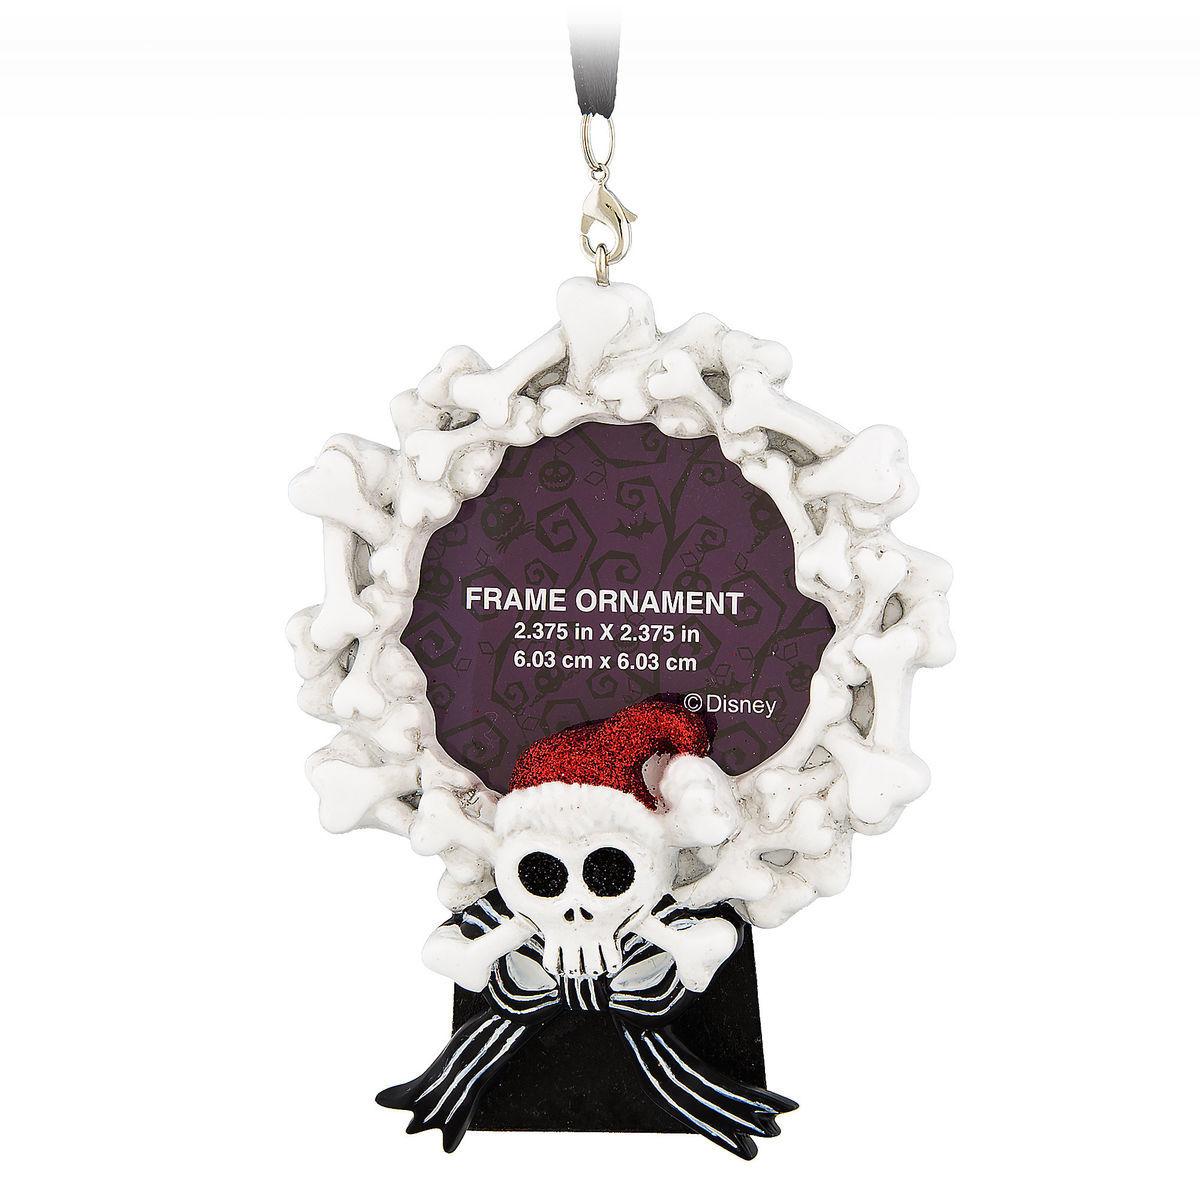 Disney Frame Ornament Jack Skellington Bone Wreath